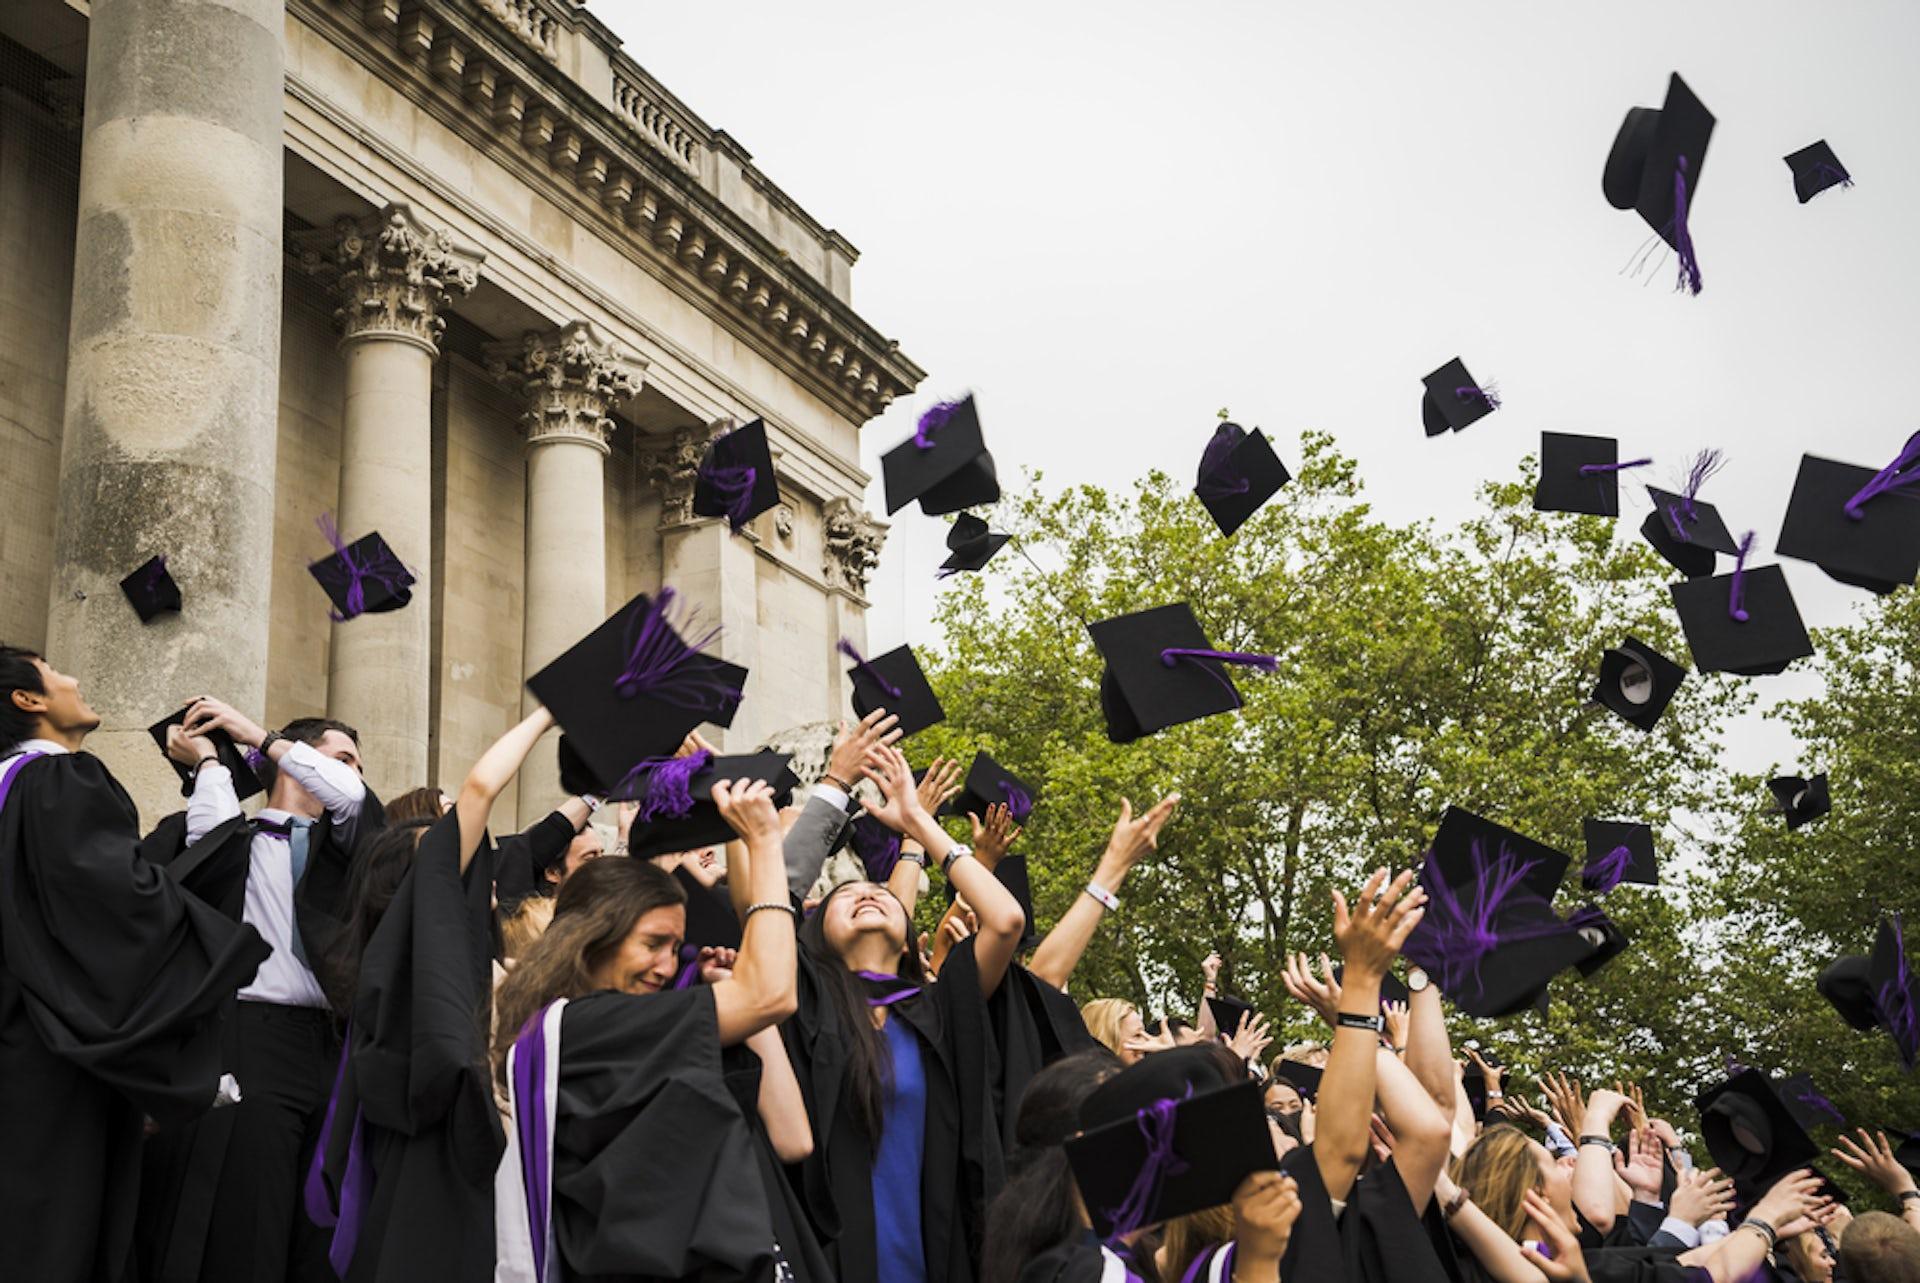 Seven ways universities benefit society